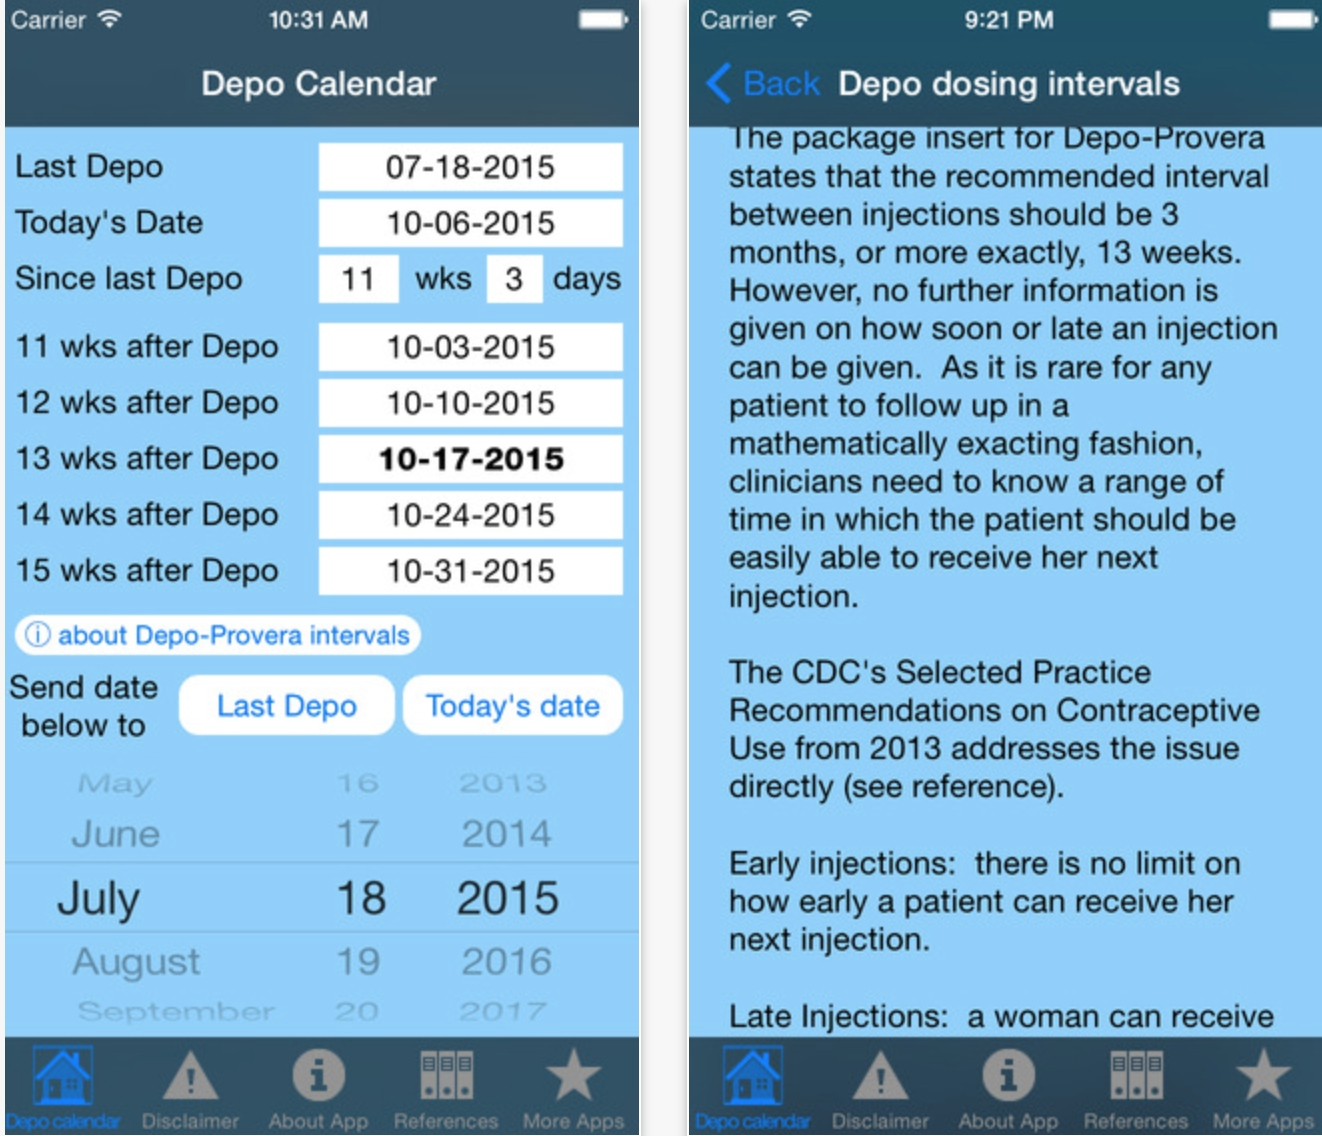 Depo Calendar App Could Significantly Improve Contraception in Depo Provera Next Dose Calendar